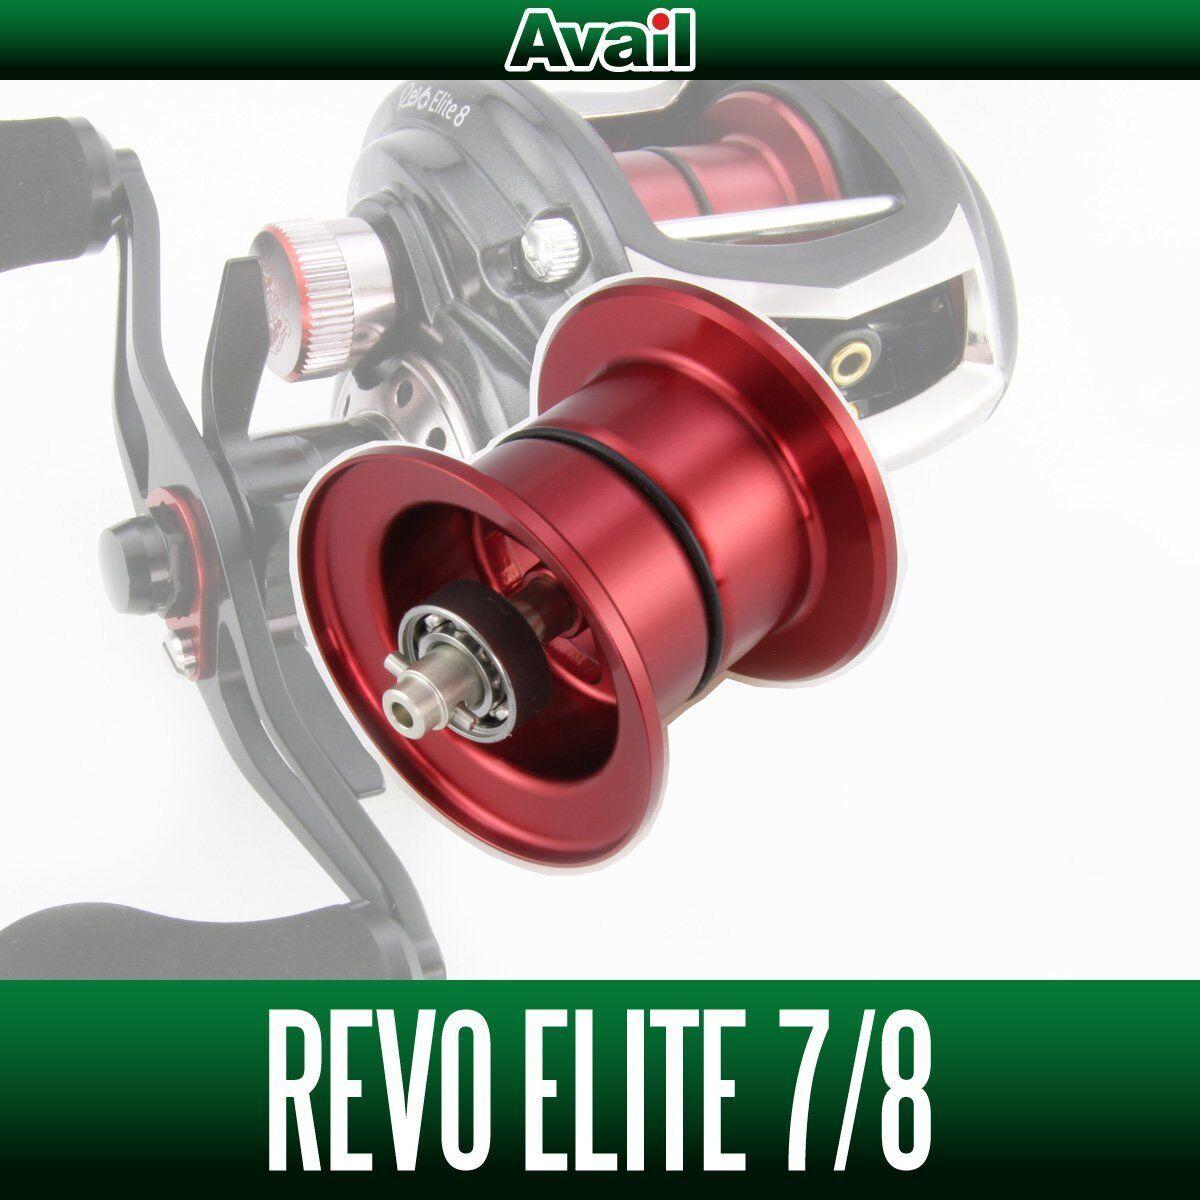 Avail ABU NEW Microcast Spool RV352R-IV for Abu Revo3 ELITE  RED  up to 50% off